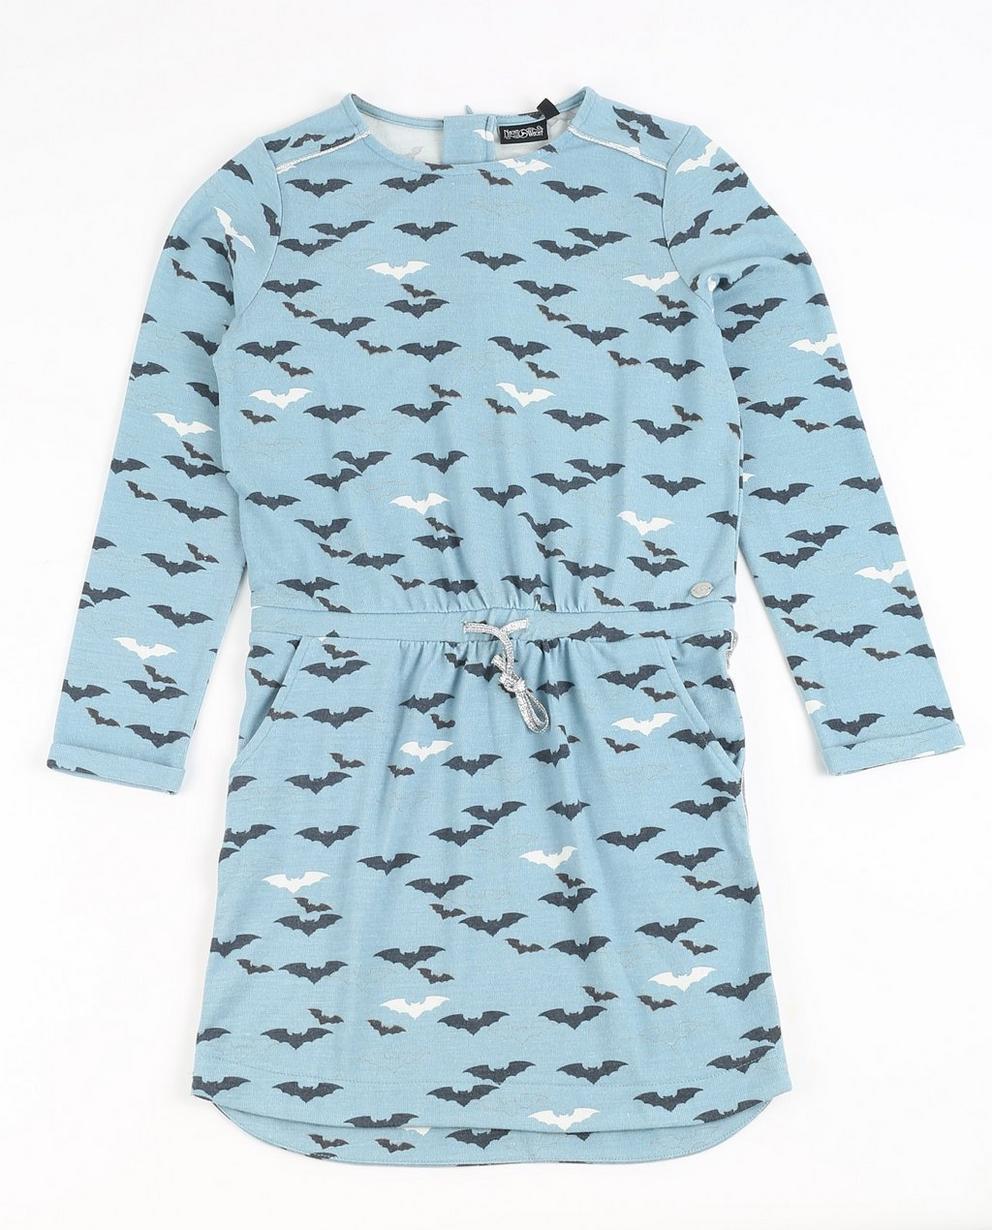 Robe Nachwacht - imprimé de chauves-souris - Nachtwacht